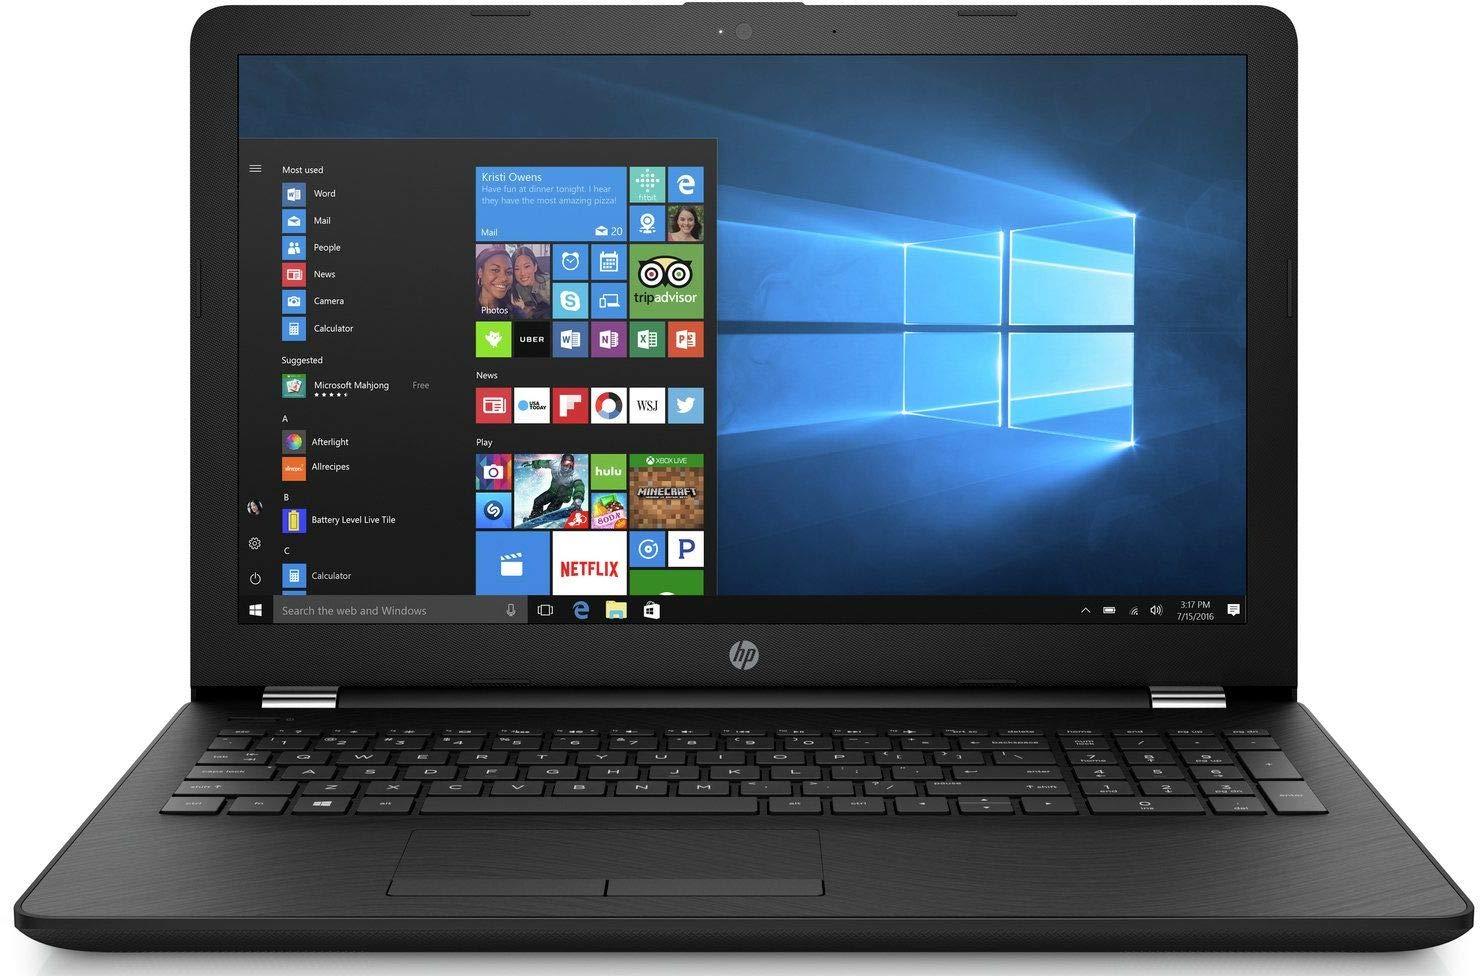 HP 15q-bu015TU 2018 15.6-inch HD Laptop (Intel Pentium N3710/4GB RAM/1TB HDD/Windows 10 Home/Intel HD Graphics), Sparkling Black